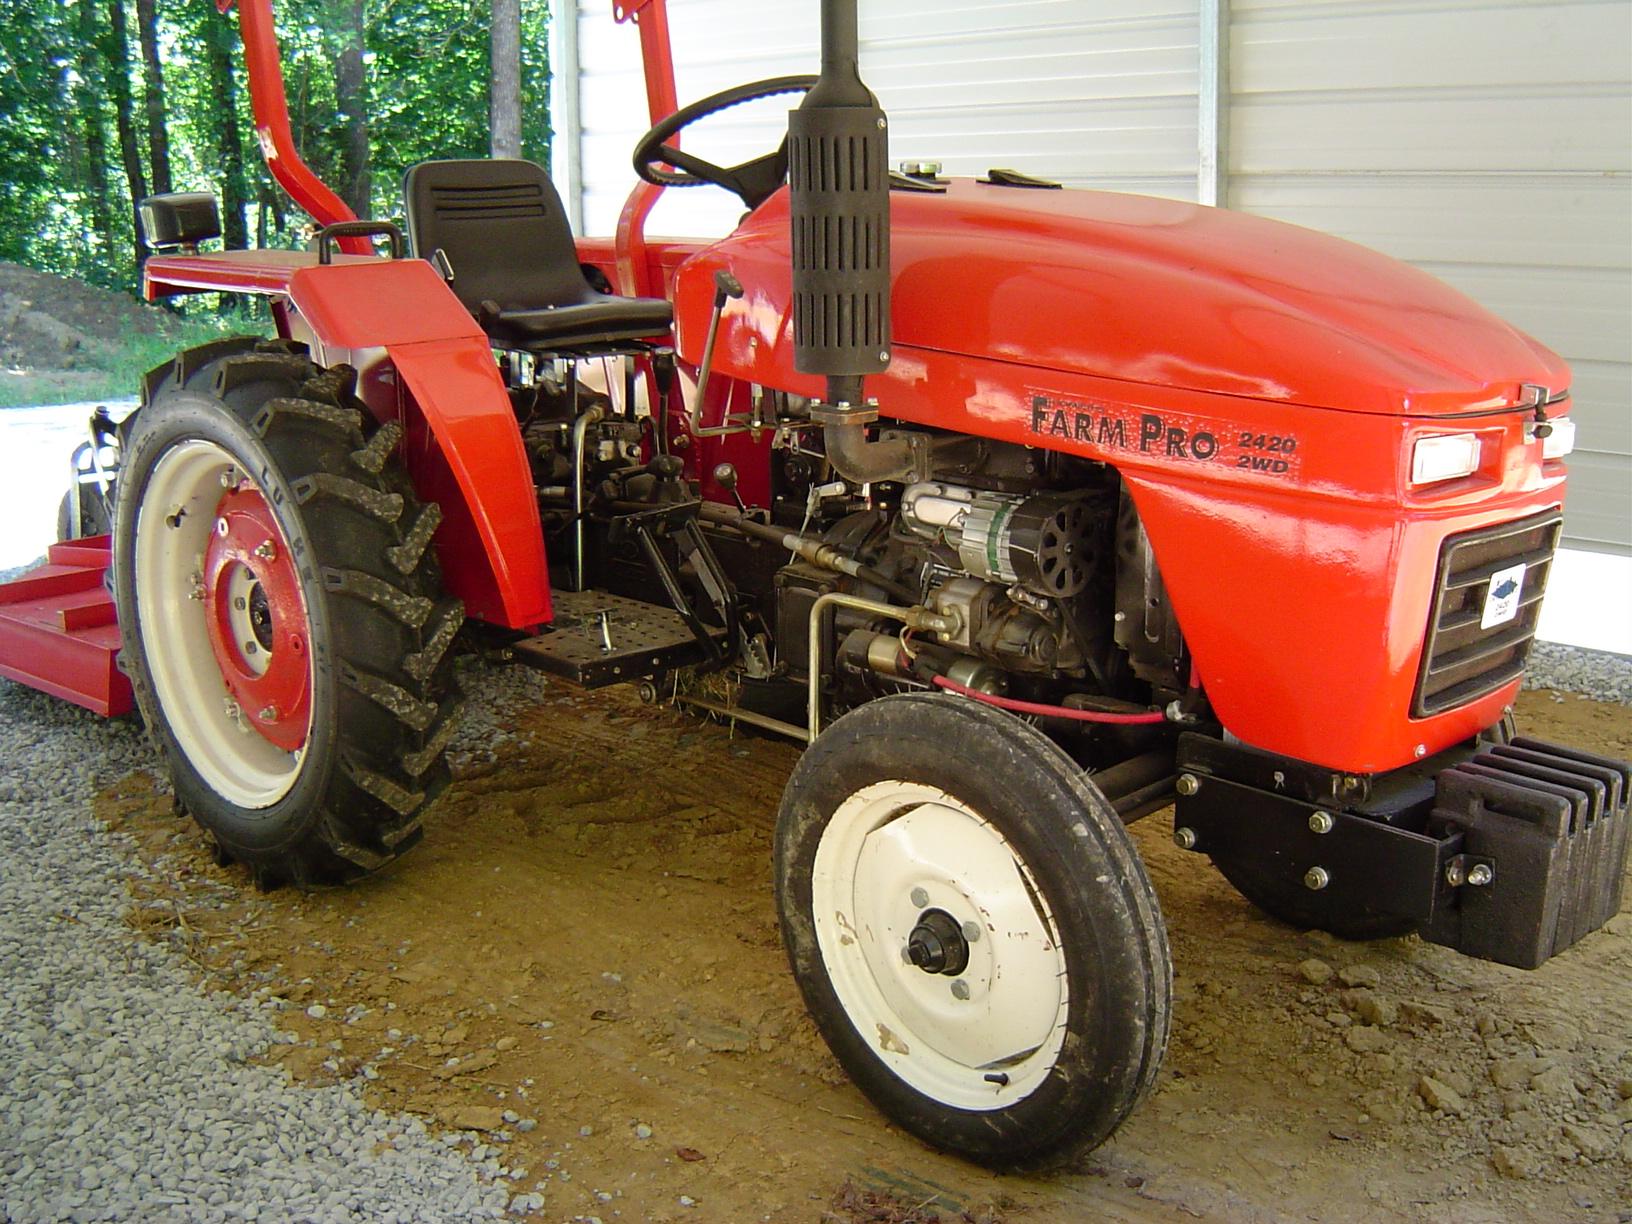 Farm Pro 2420 Farm Pro Tractor Starter Wiring Diagram on